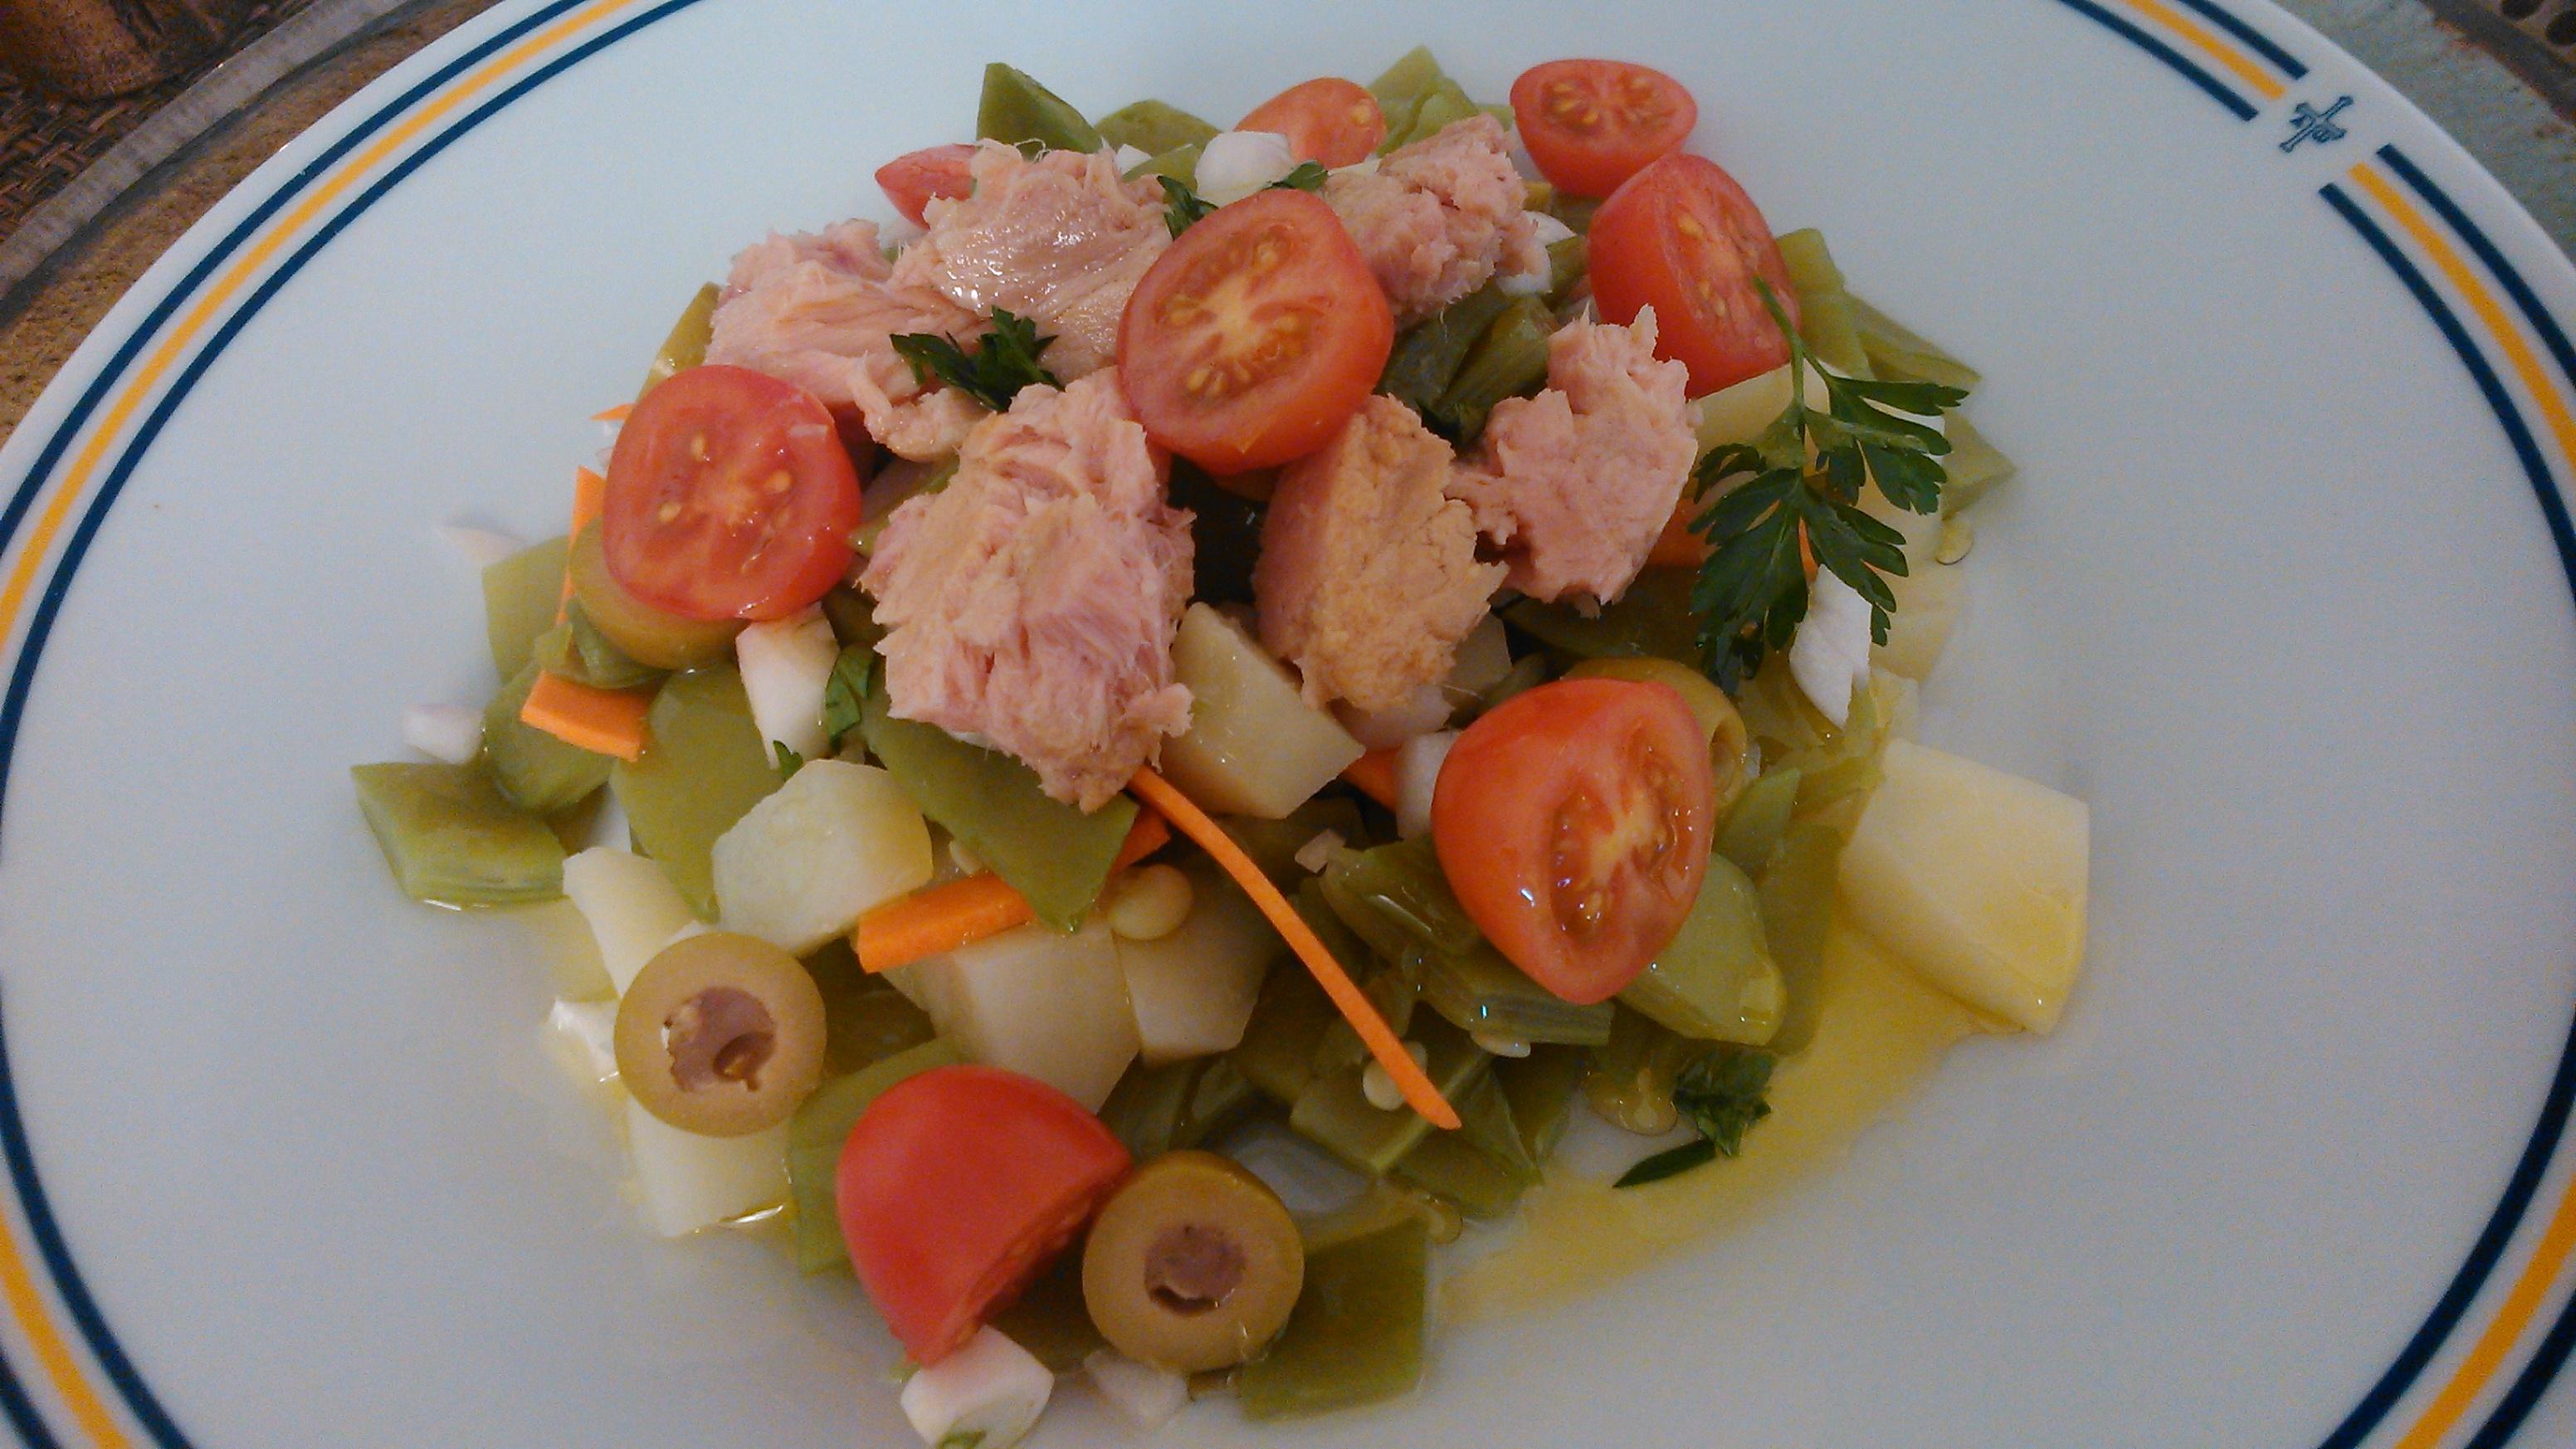 Ensalada de judias verdes aprende cocina - Ensalada de judias verdes arguinano ...